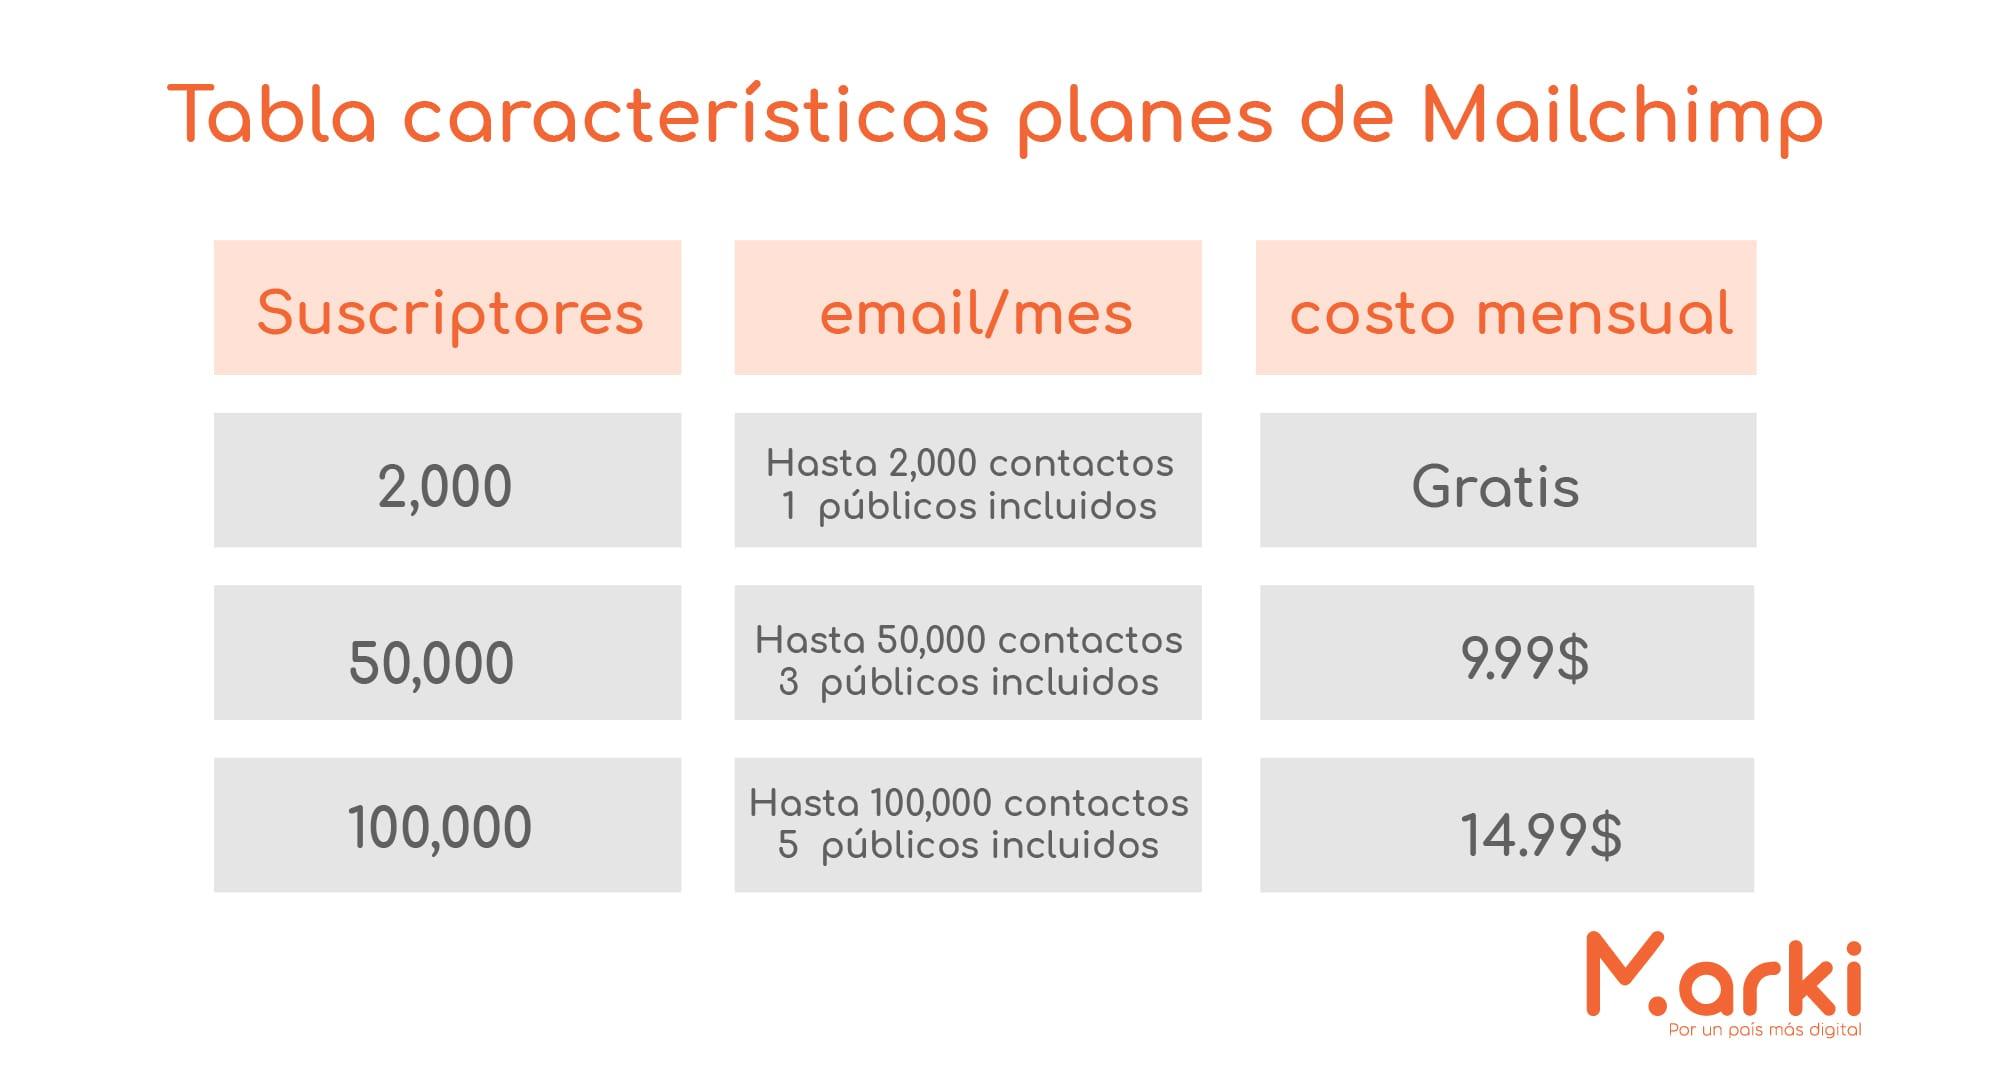 mailchimp planes mailchimp como hacer email marketing gratis campañas de mailing estrategias de email marketing ¿Cúal es la mejor herramienta de email marketing? diseño marki voluntariado marki